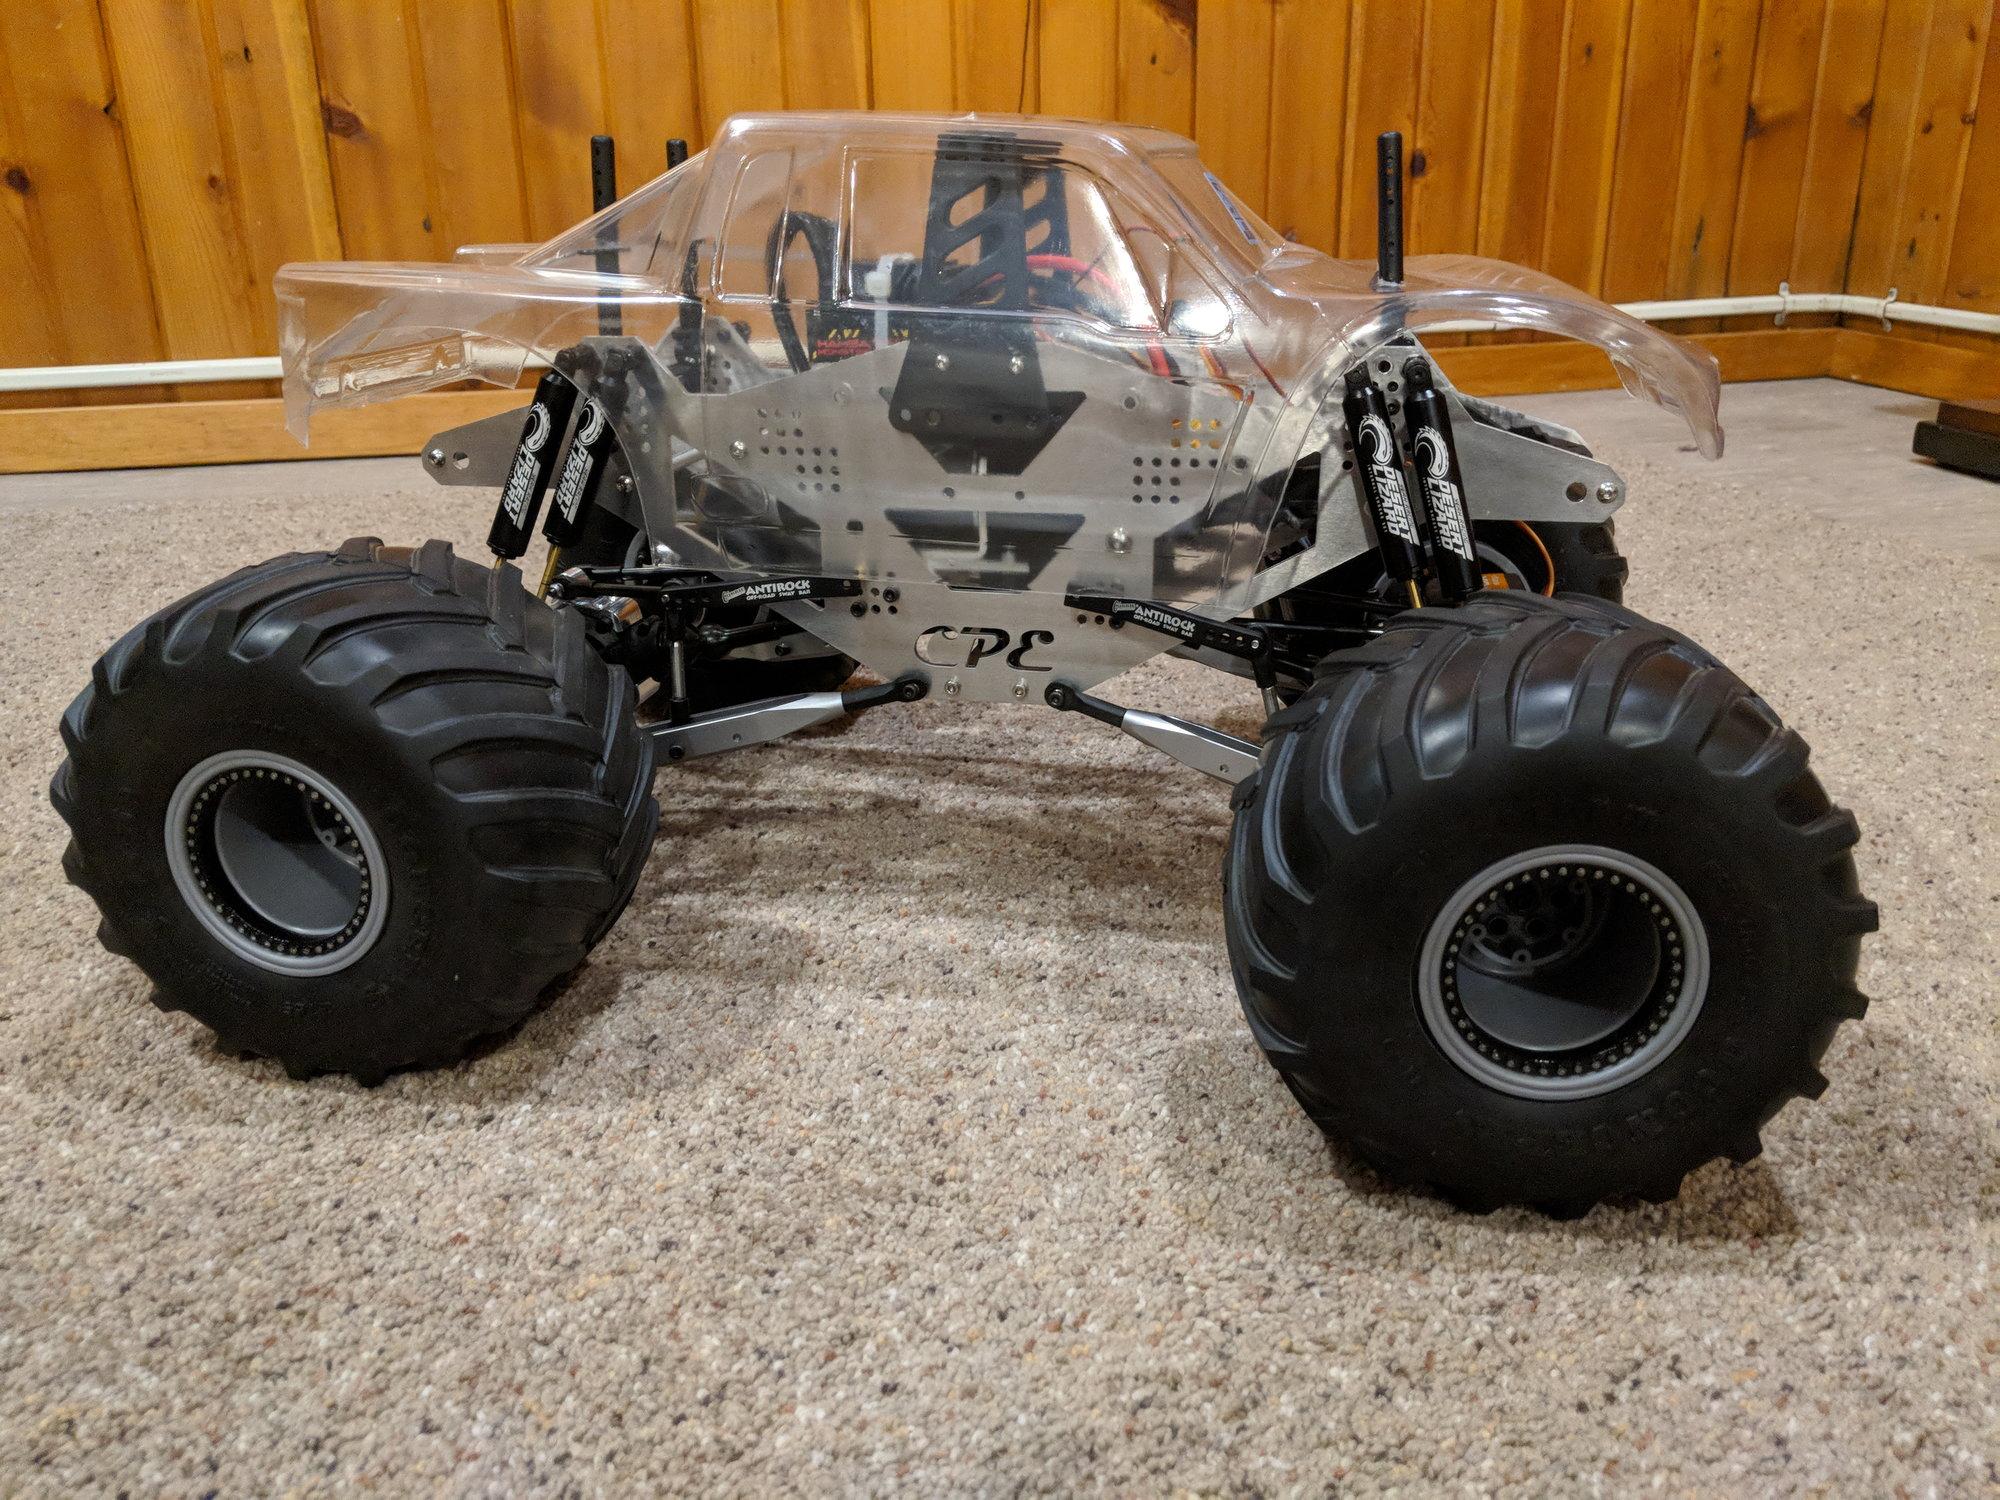 Monster Jam Solid Axle Monster Truck Best Platform R C Tech Forums